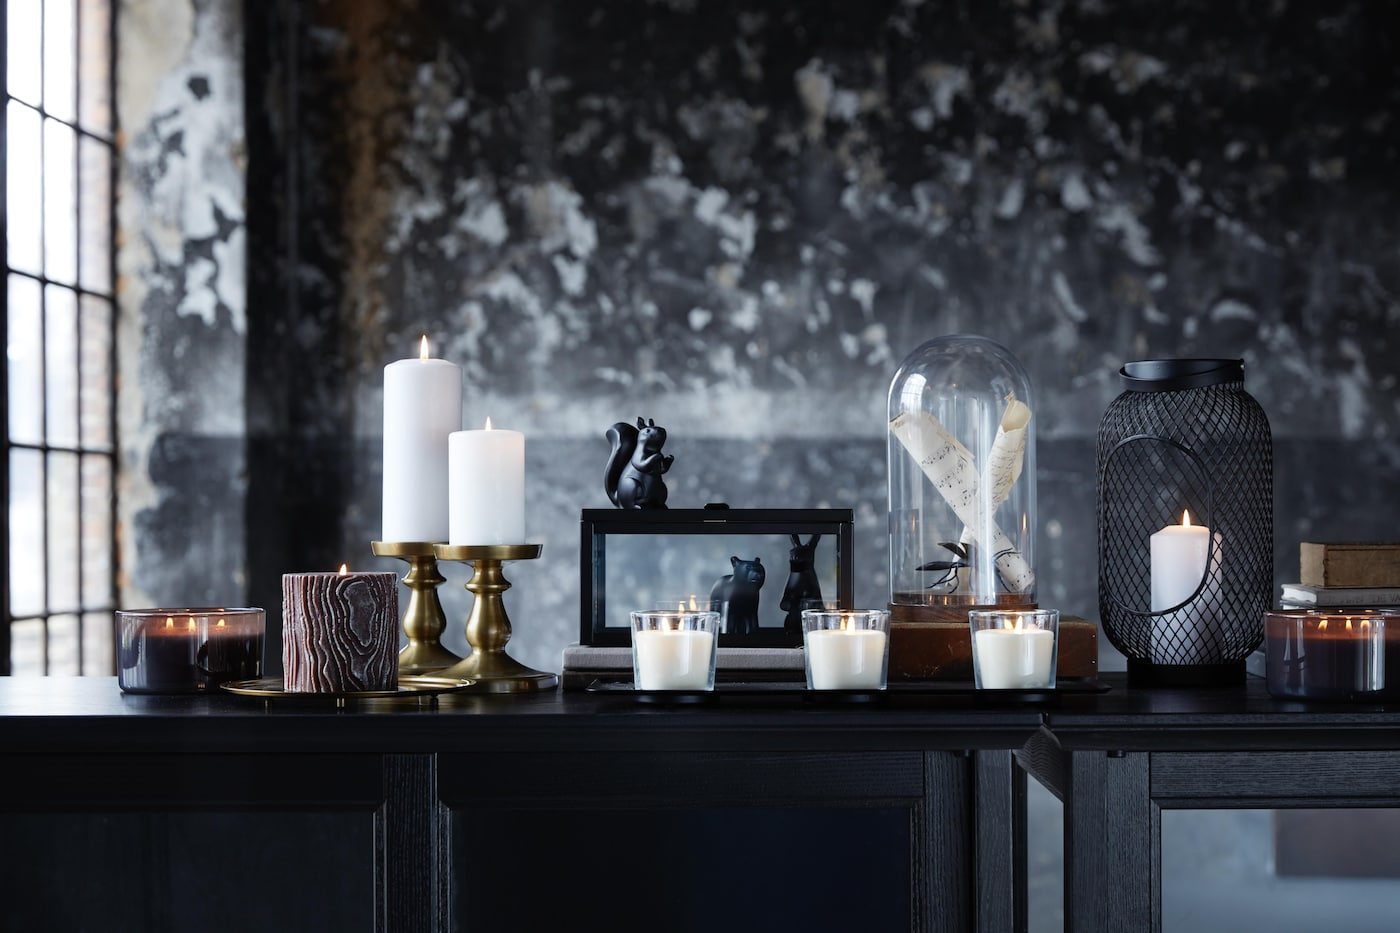 Verschiedene Kerzen erleuchten den Raum